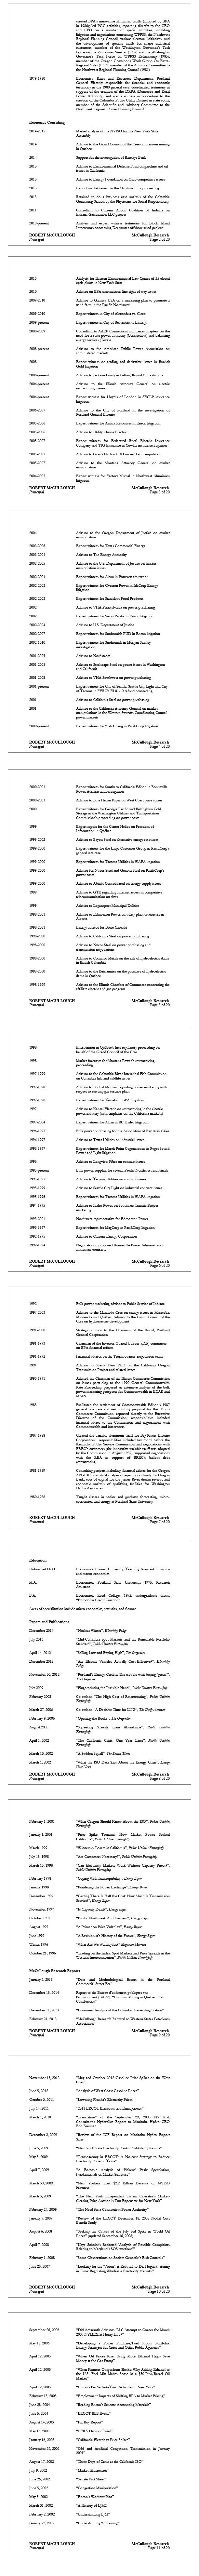 Site-C-Economic-Evaluation-16-RM-C.jpg